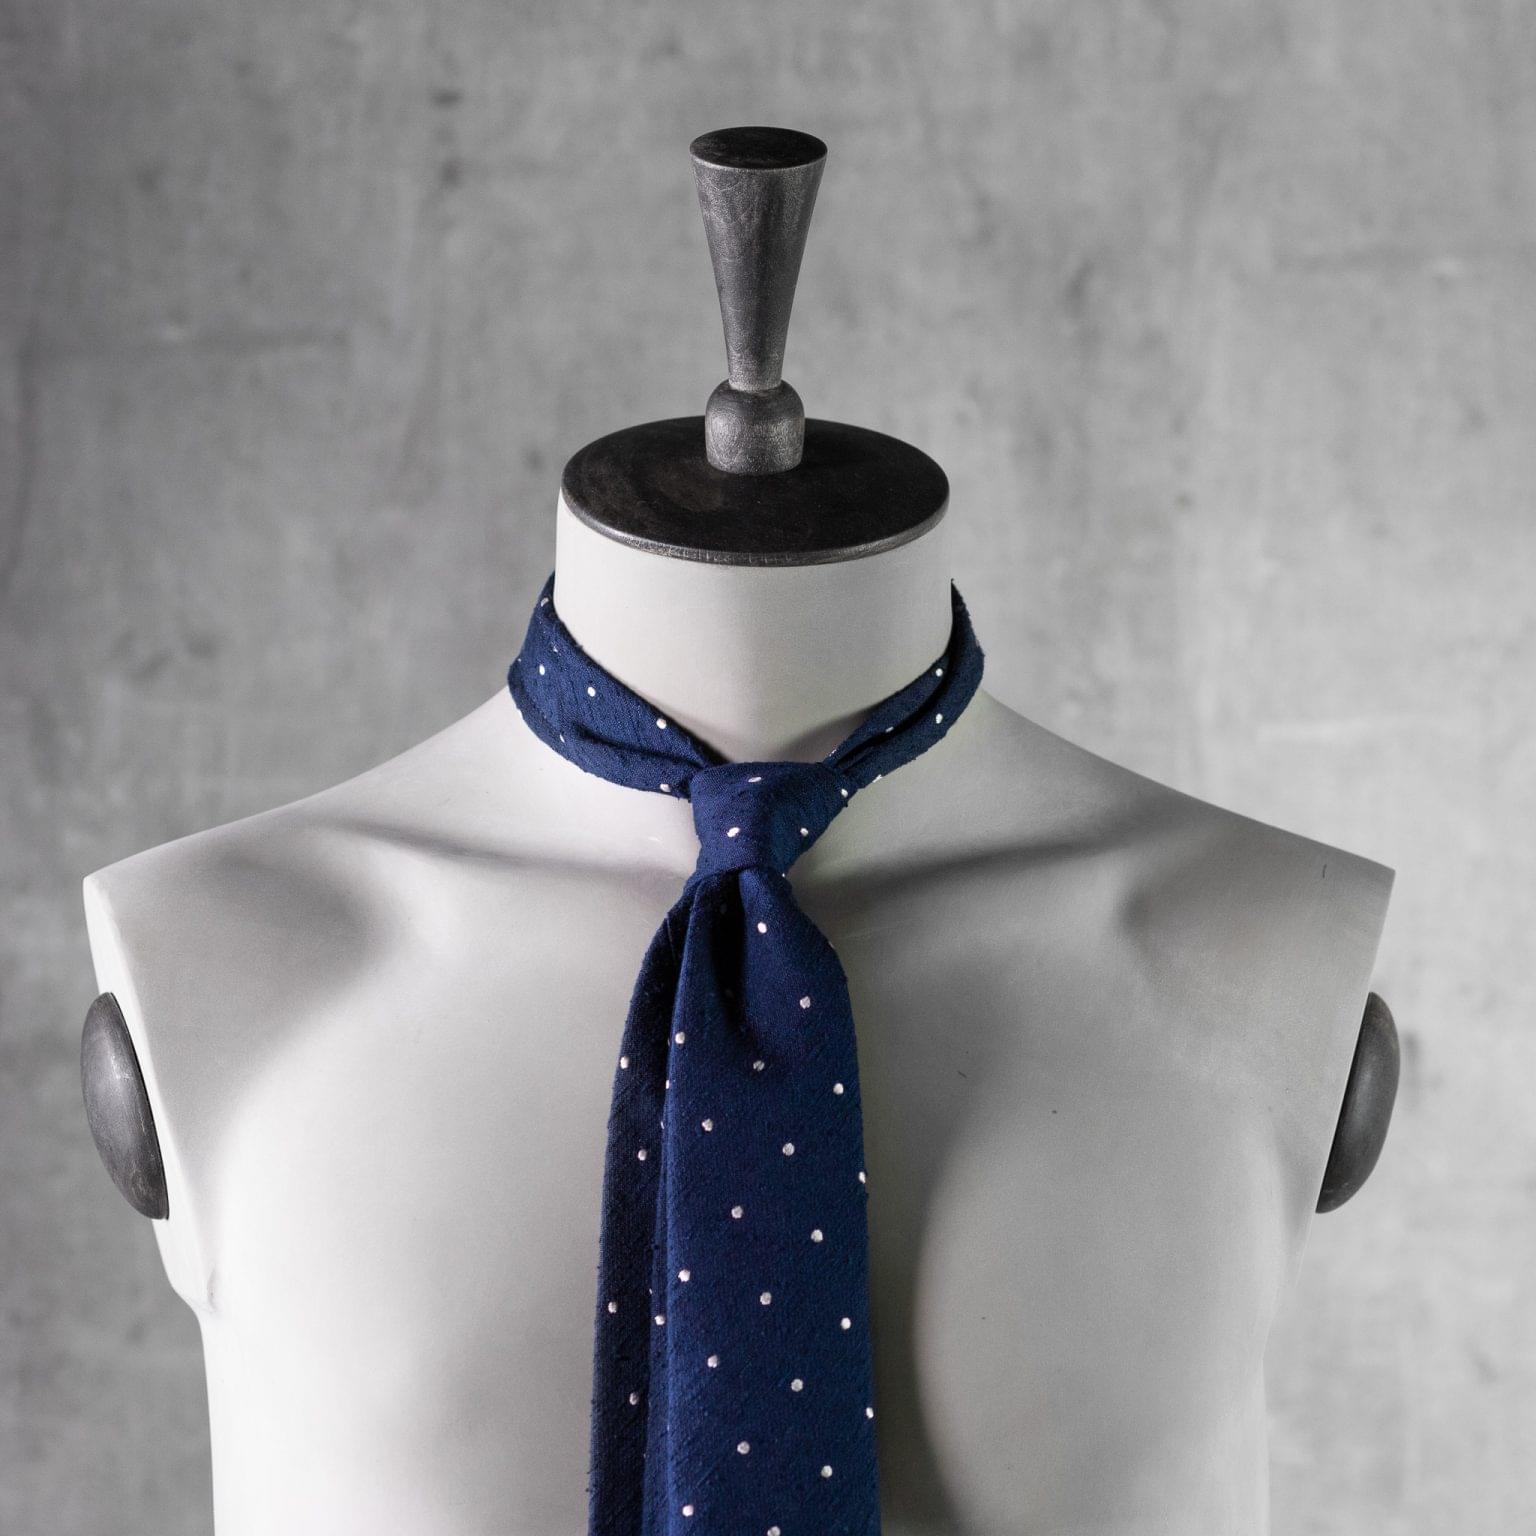 SHANTUNG-0527-Tie-Initials-Corbata-Iniciales-The-Seelk-3